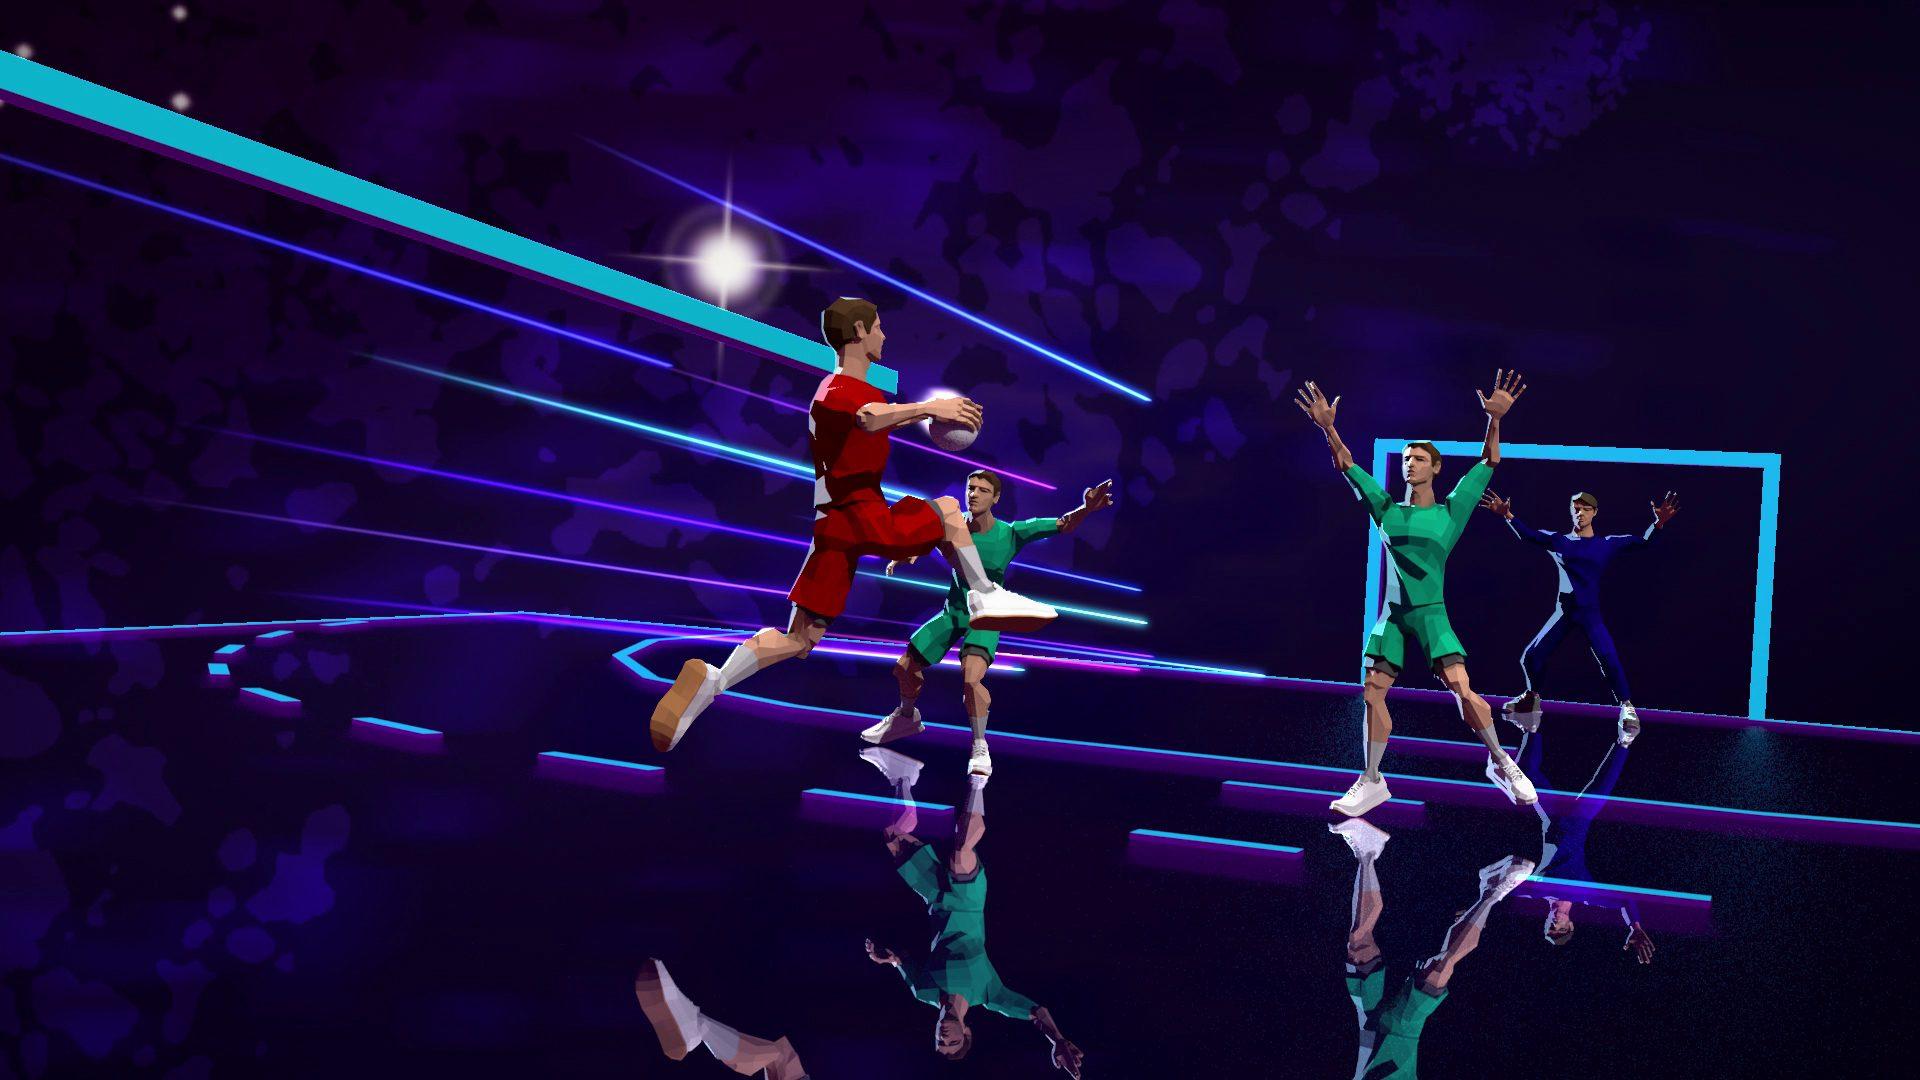 EHF_2022_lowpoly_02